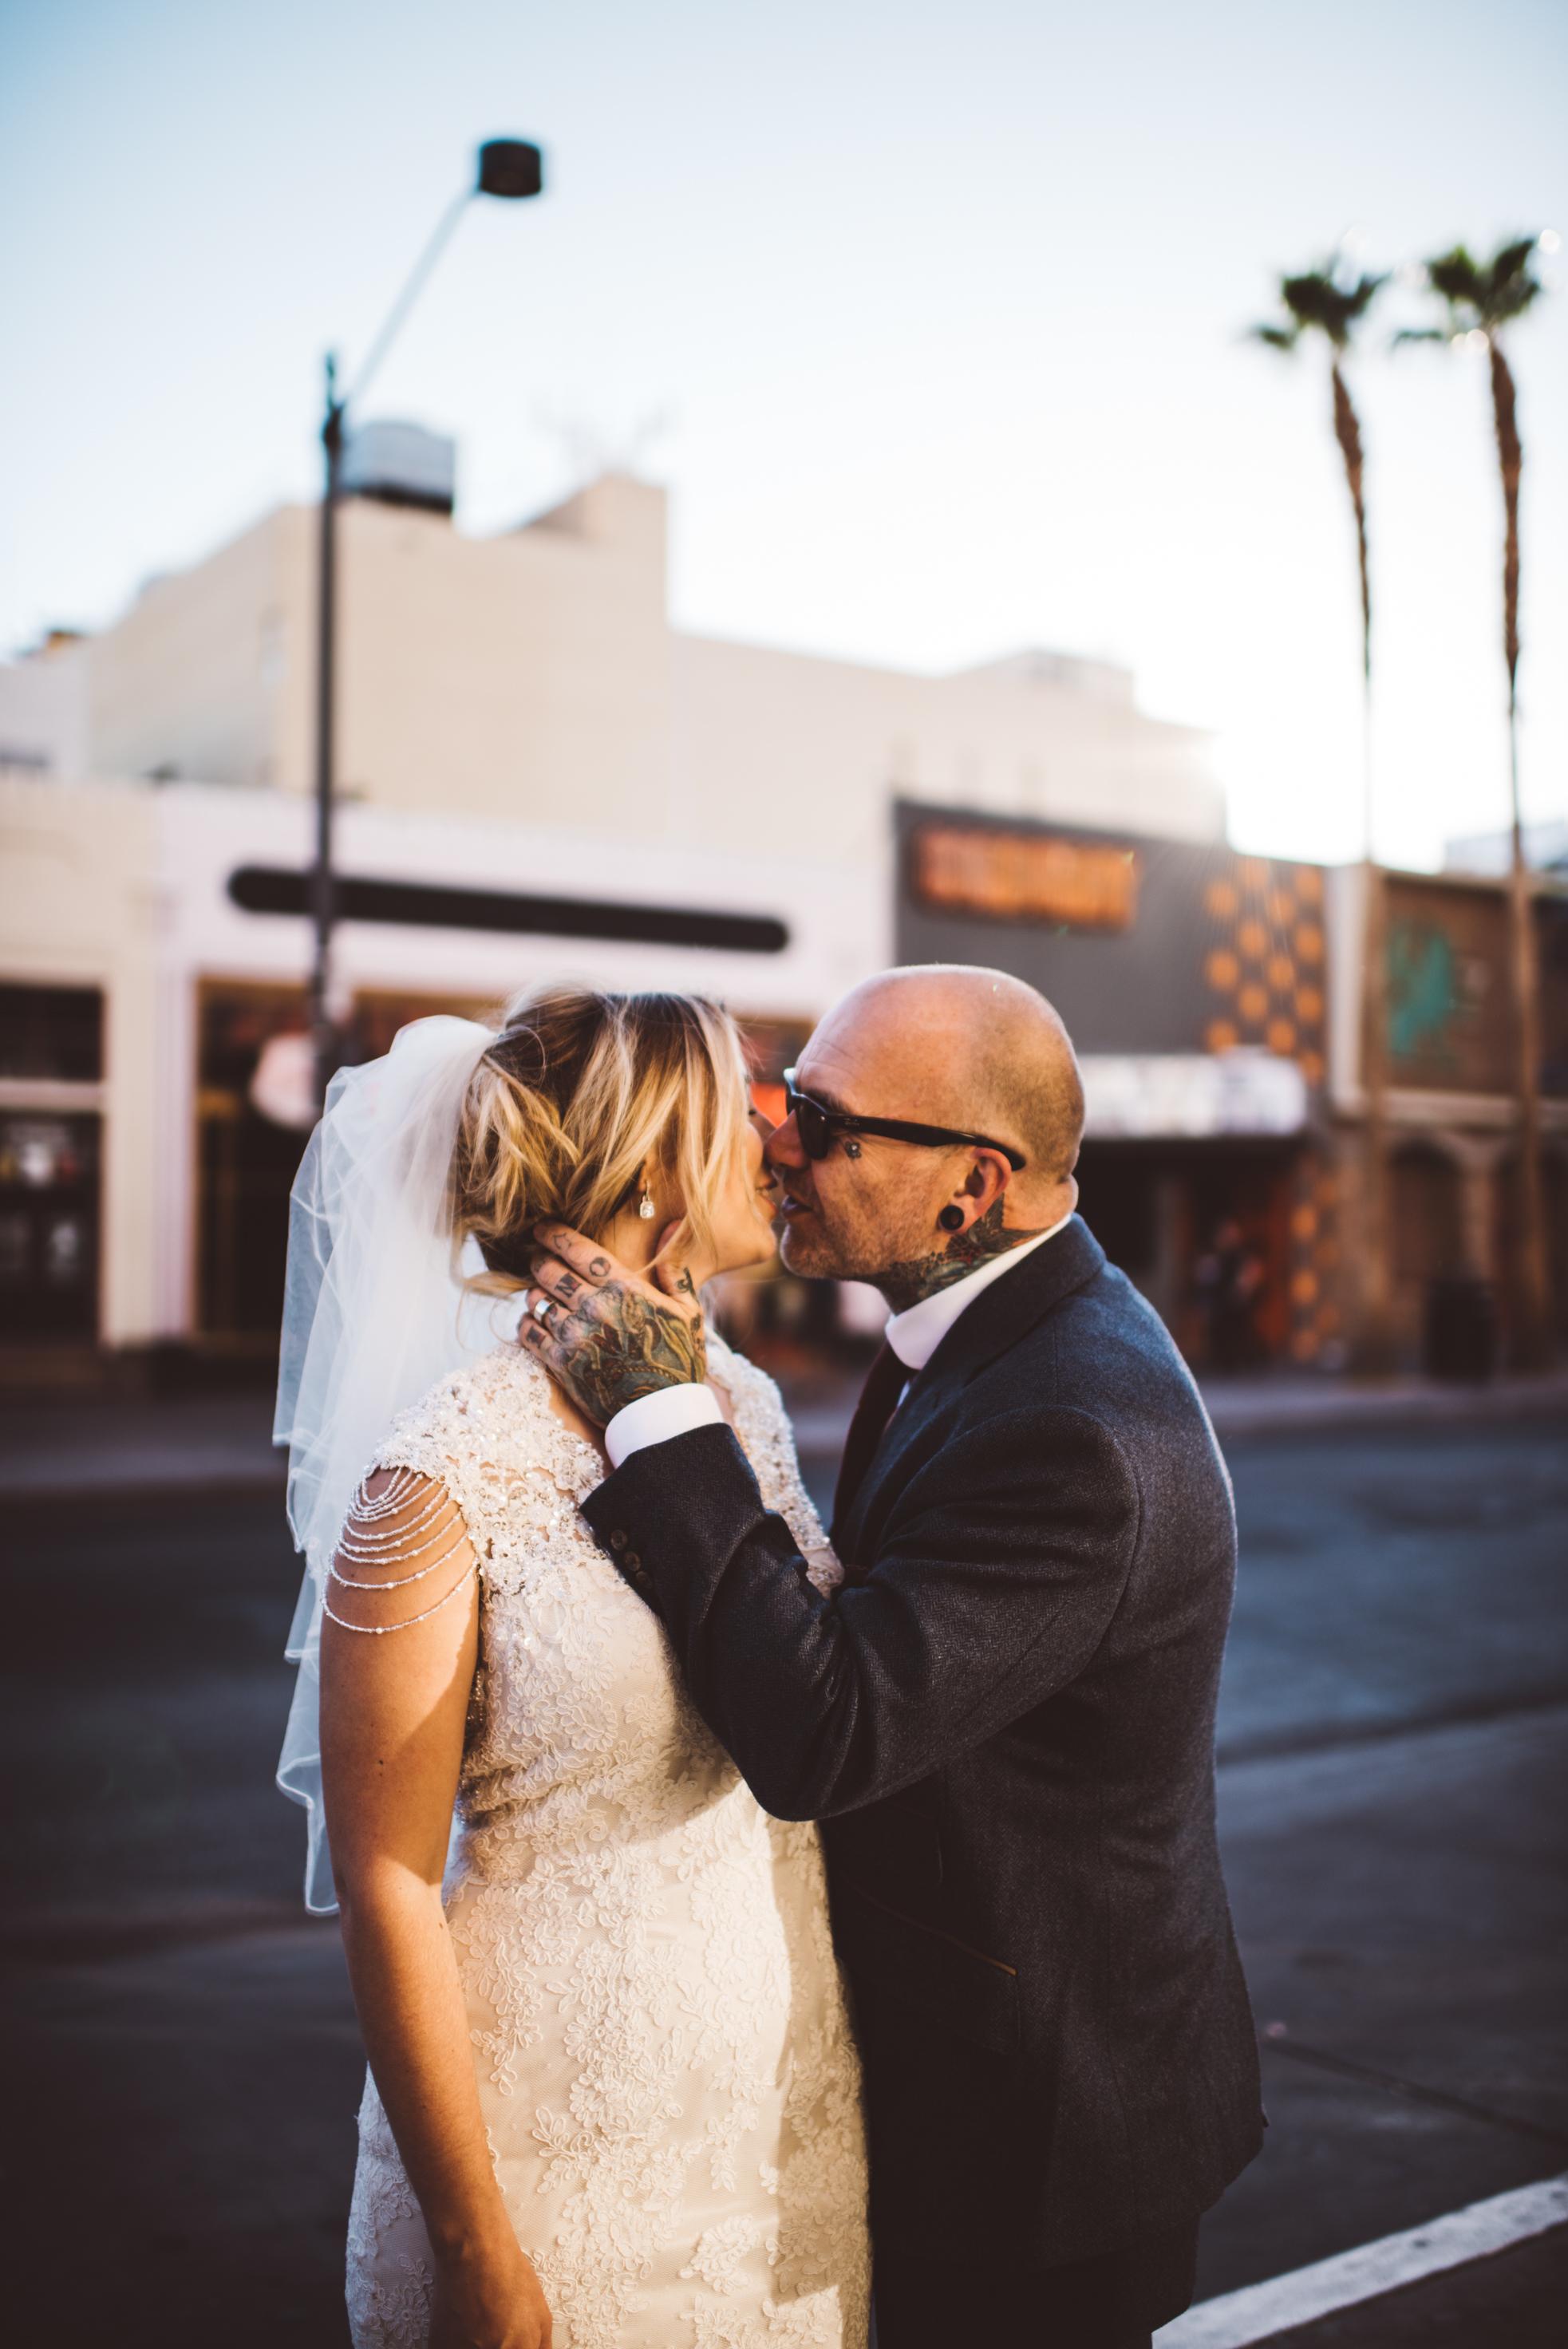 Las Vegas Elopement Photographer Ashley Marie Myers Rock'n Roll Bride-124.jpg